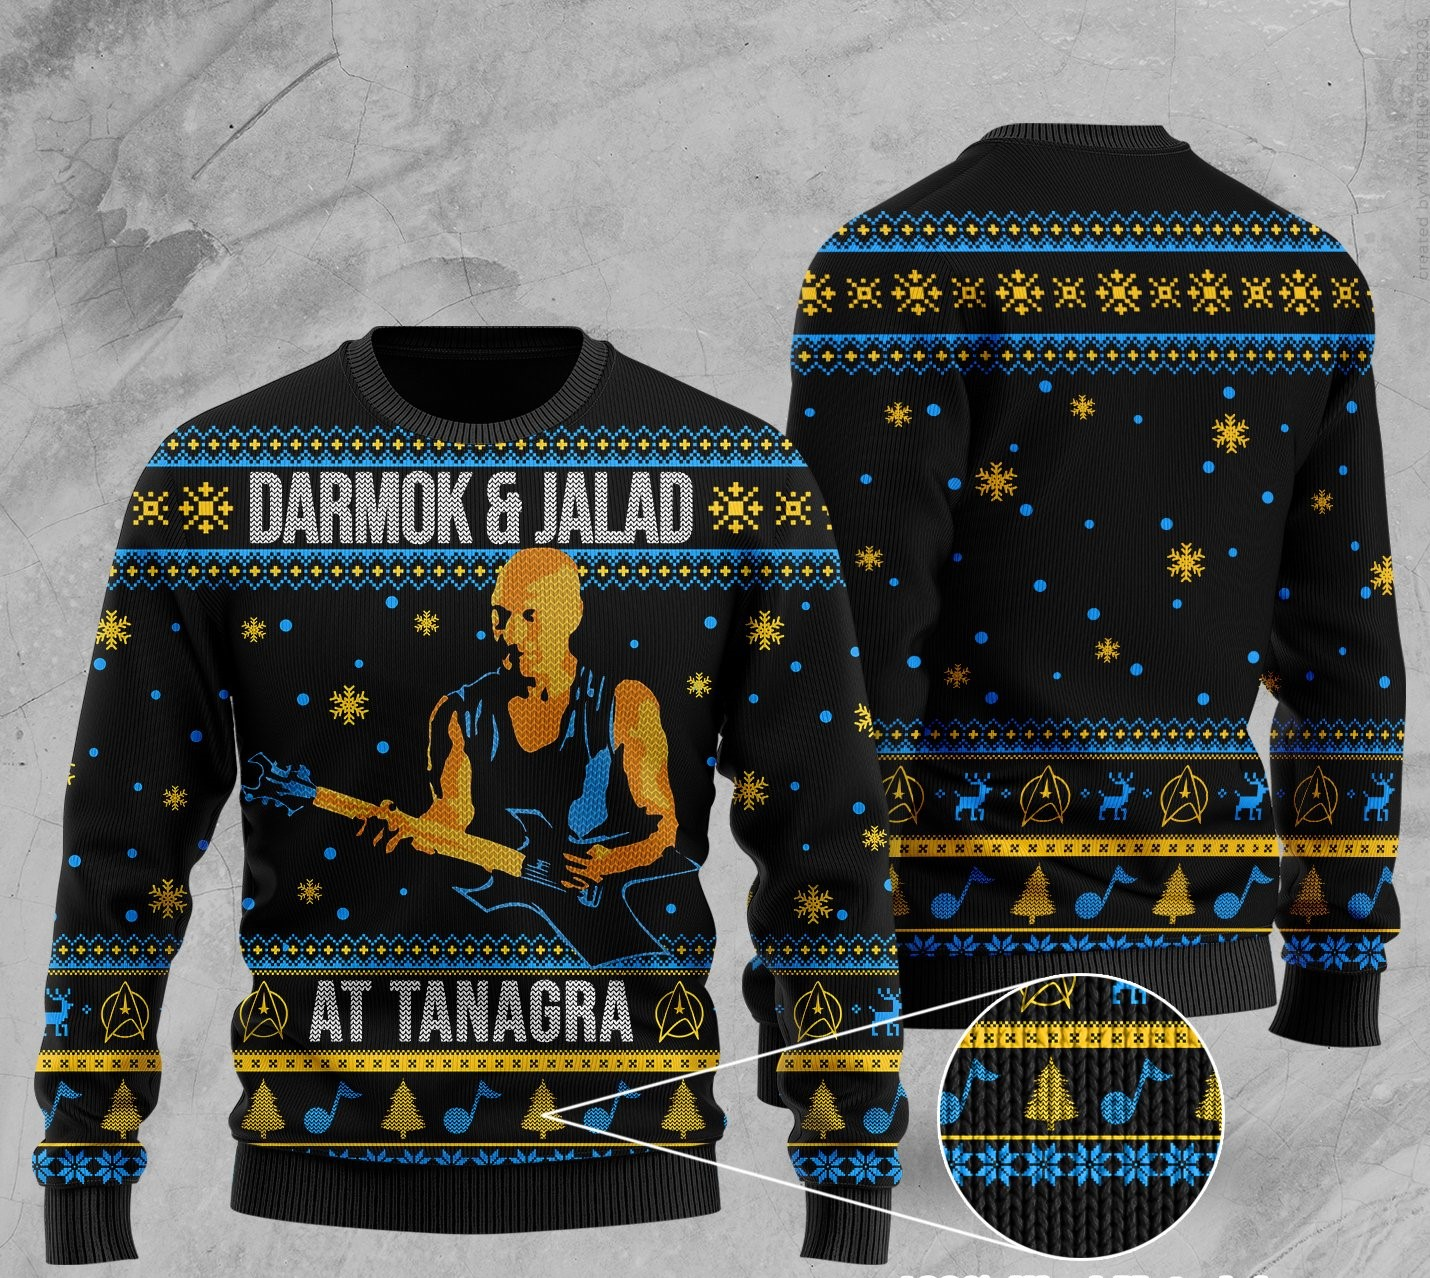 darmok and jalad at tanagra all over printed ugly christmas sweater 2 - Copy (2)